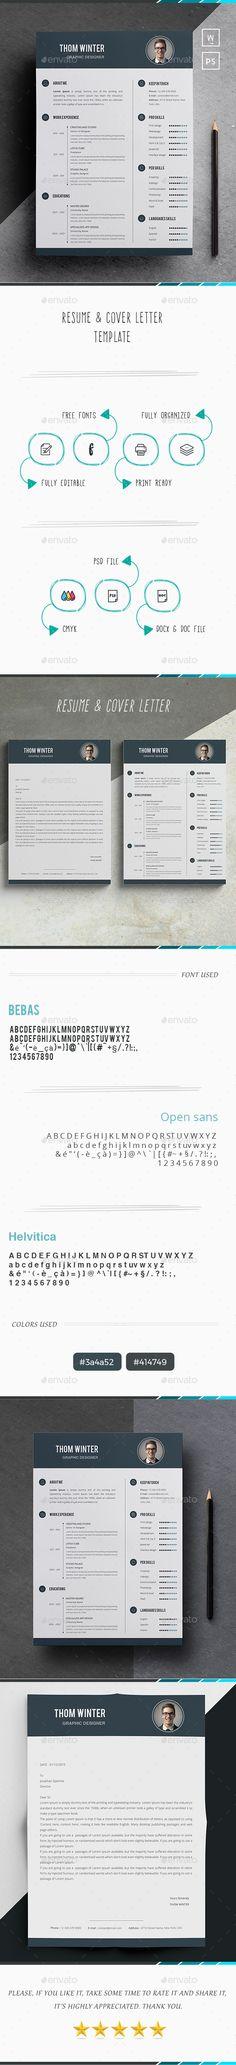 Free Resume Template by Pixeden Design Popular